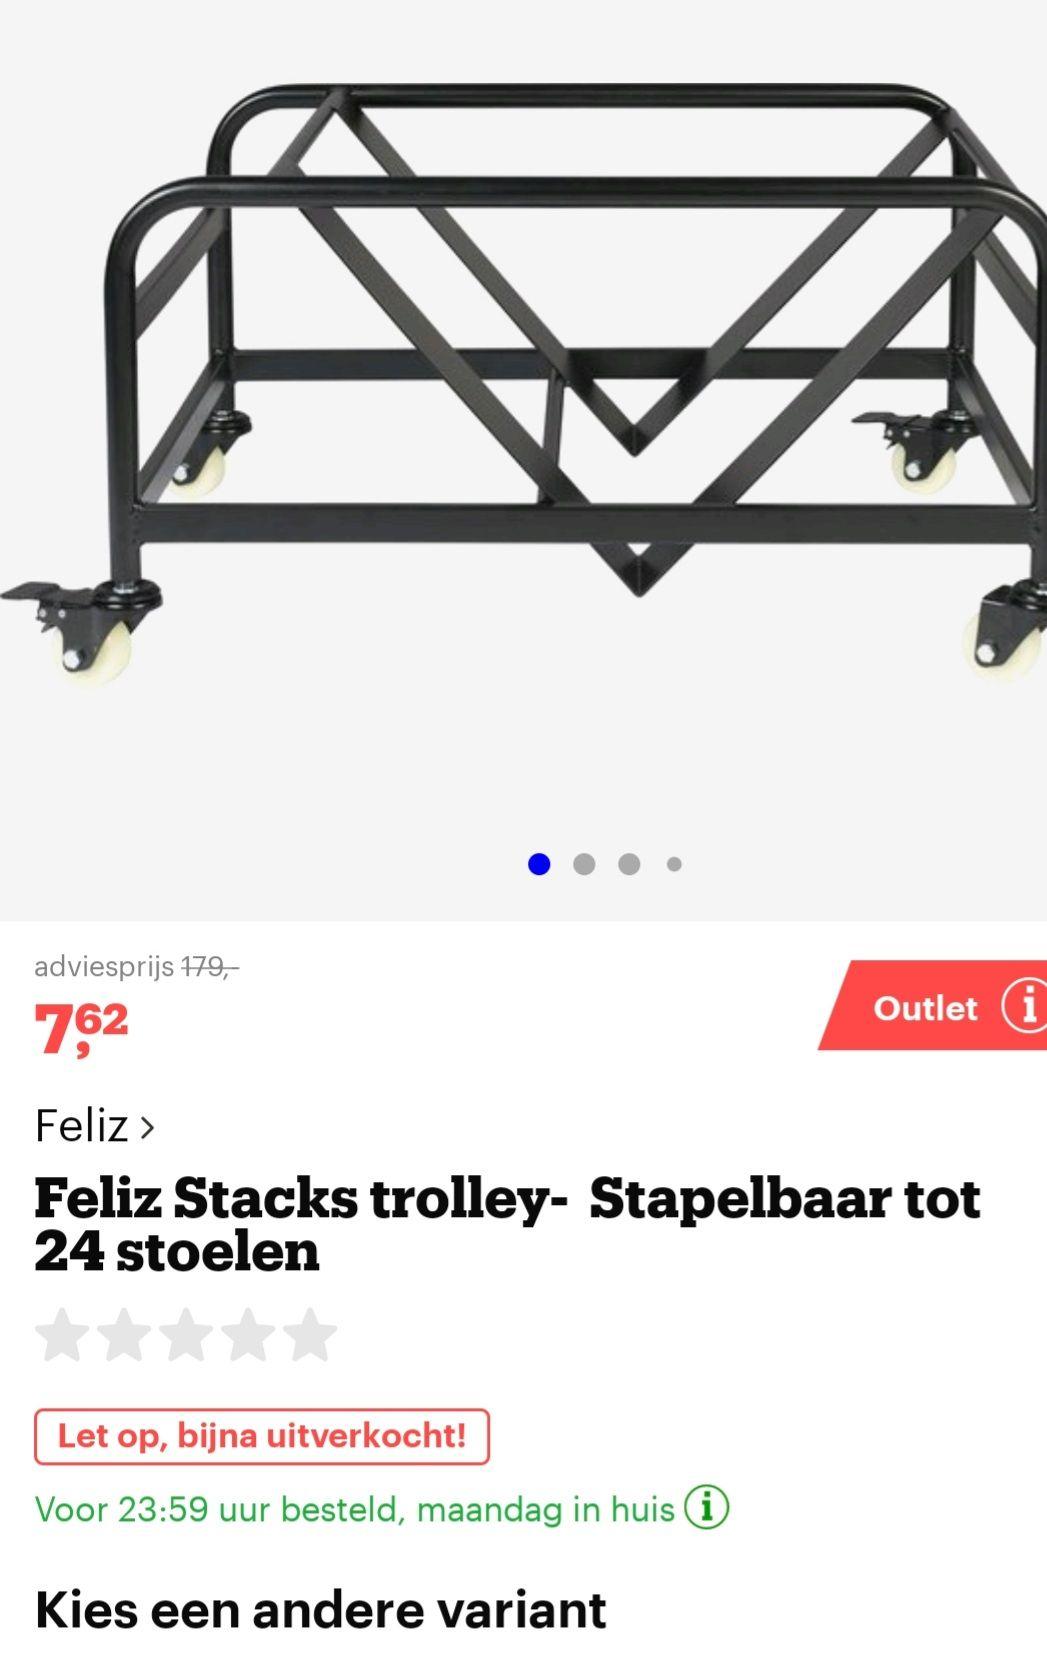 Feliz Stacks trolley- Stapelbaar tot 24 stoelen